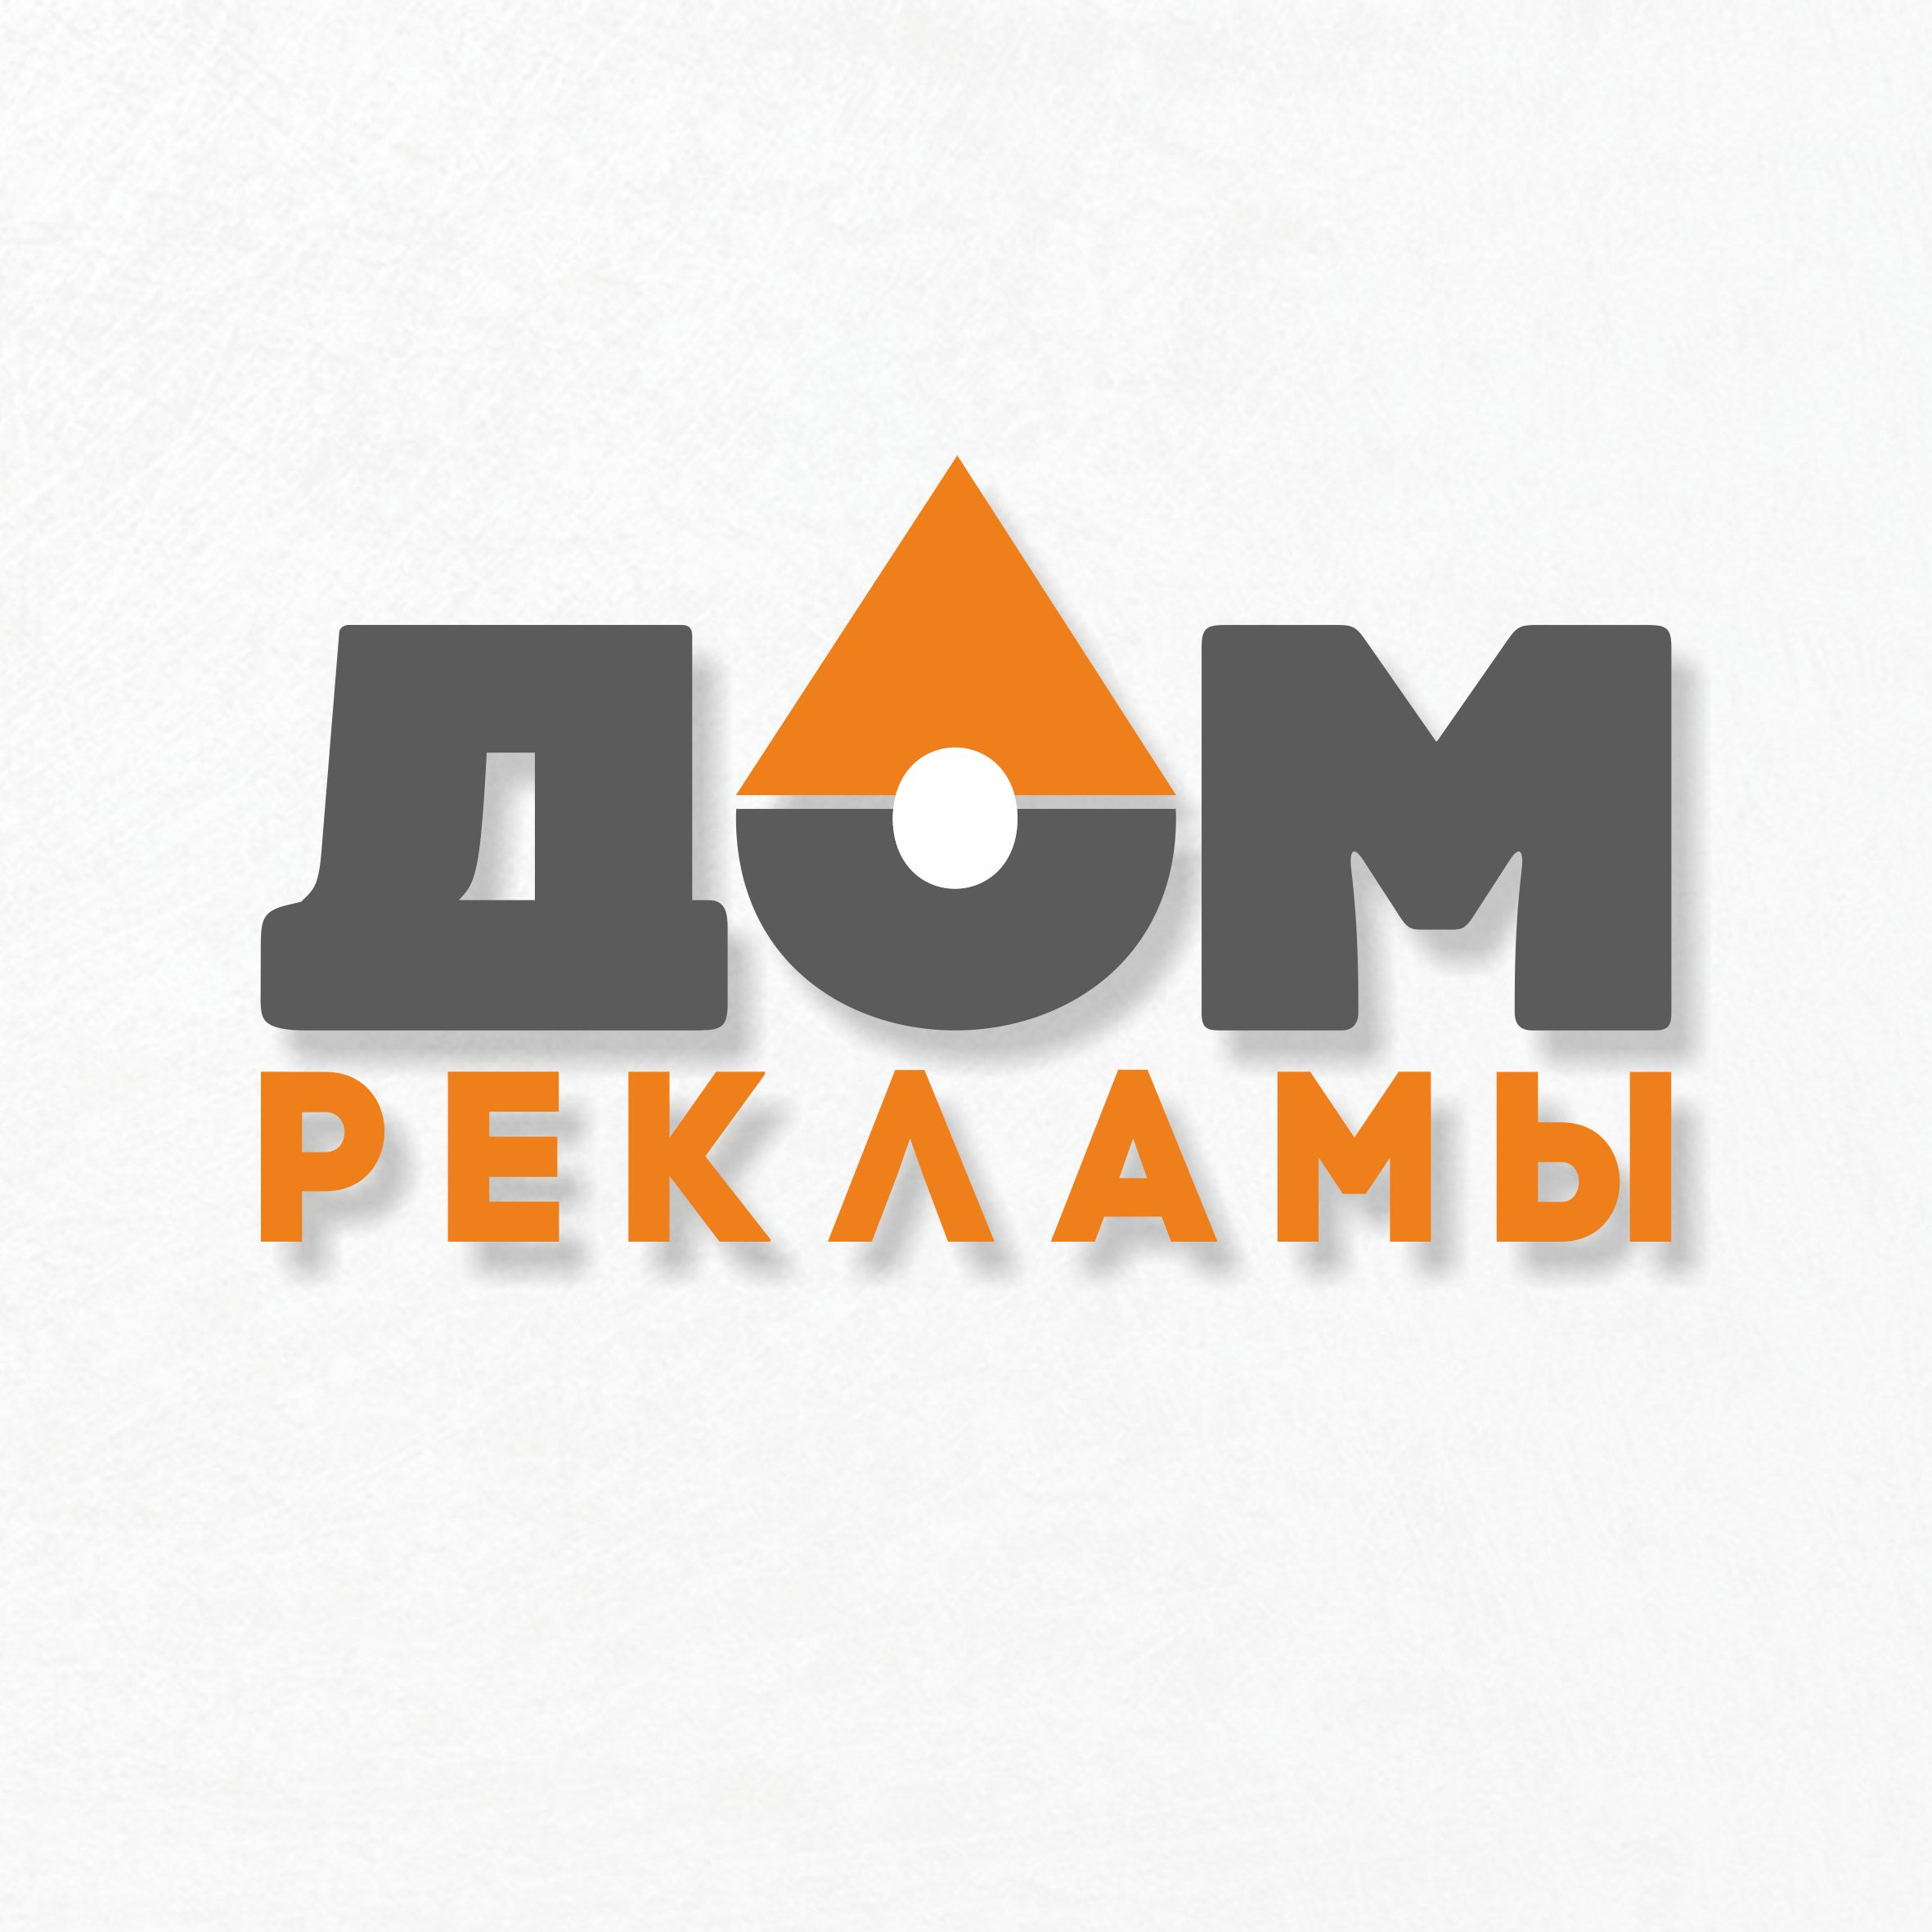 Дизайн логотипа рекламно-производственной компании фото f_1575edbc4b090e54.jpg